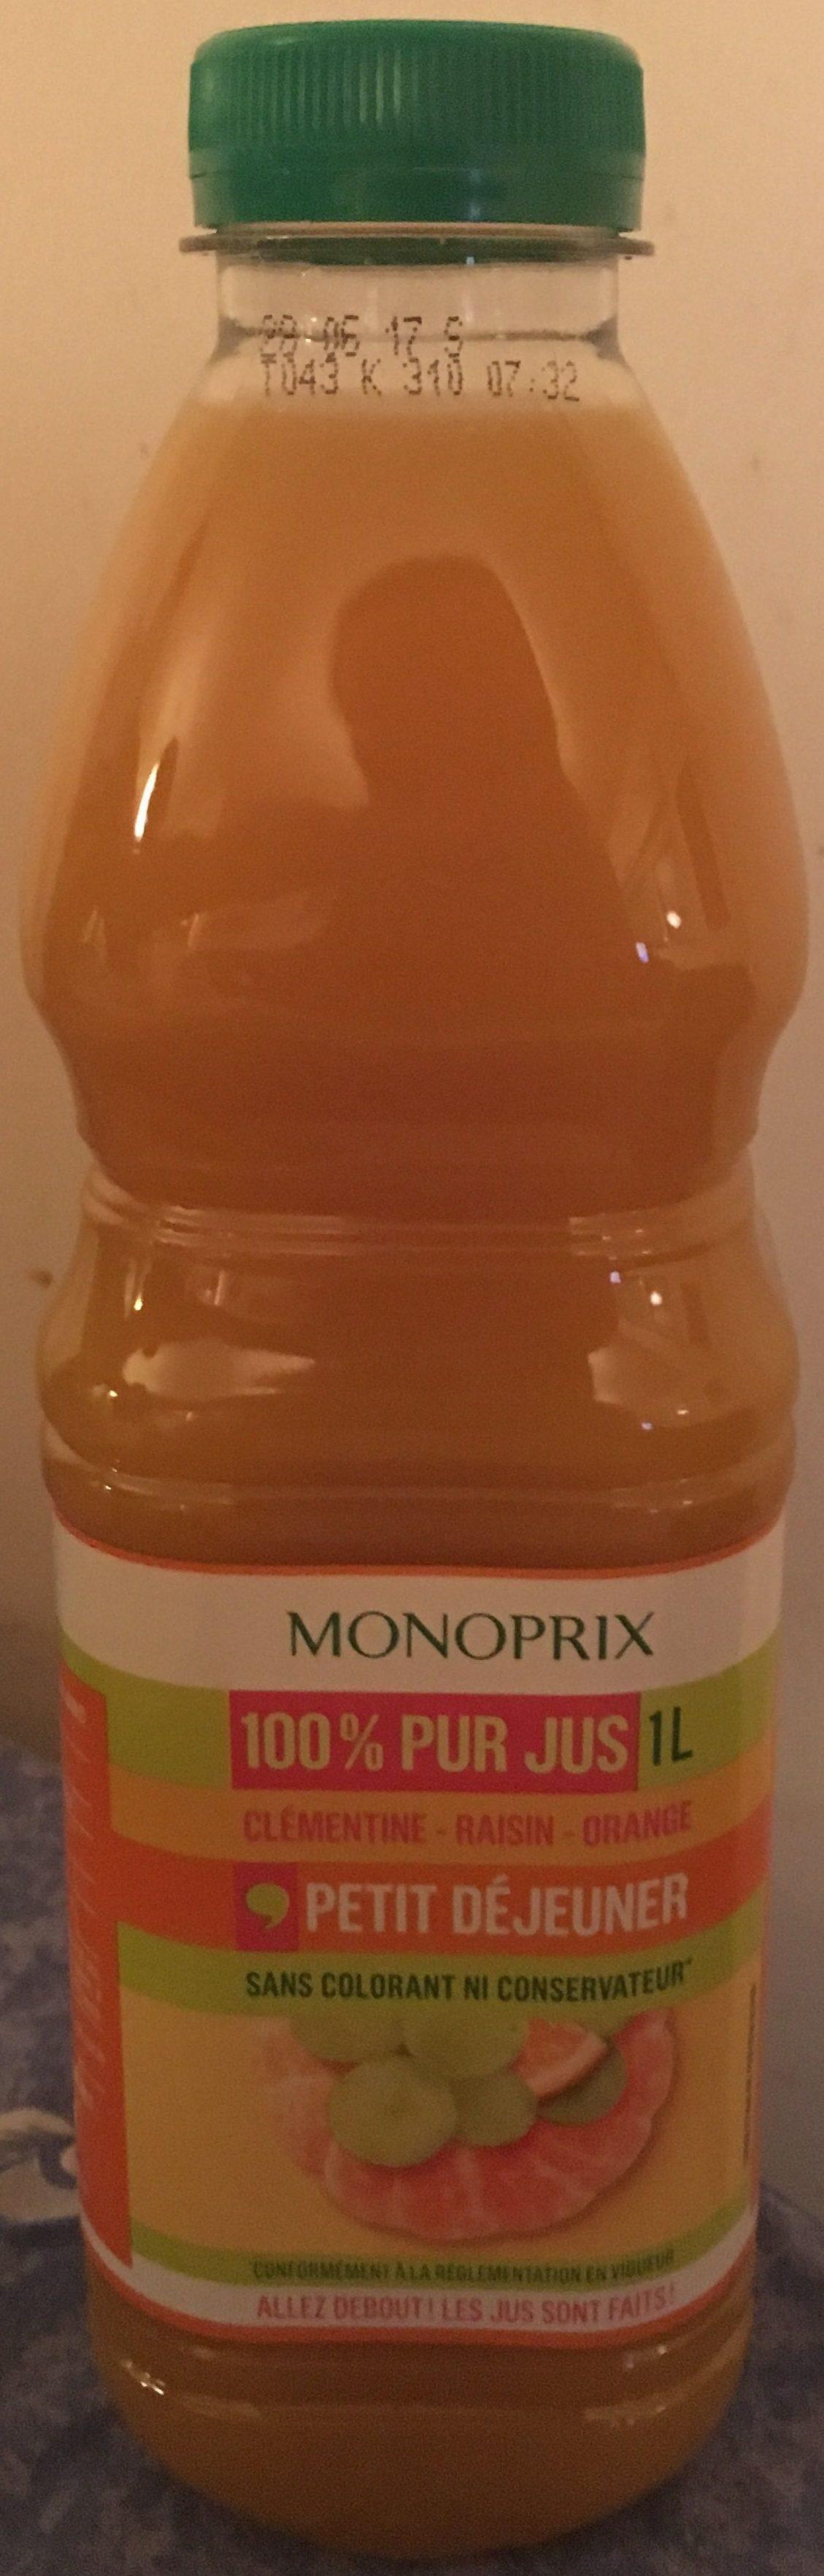 100% Pur jus Clémentine, Raisin et Orange - Product - fr